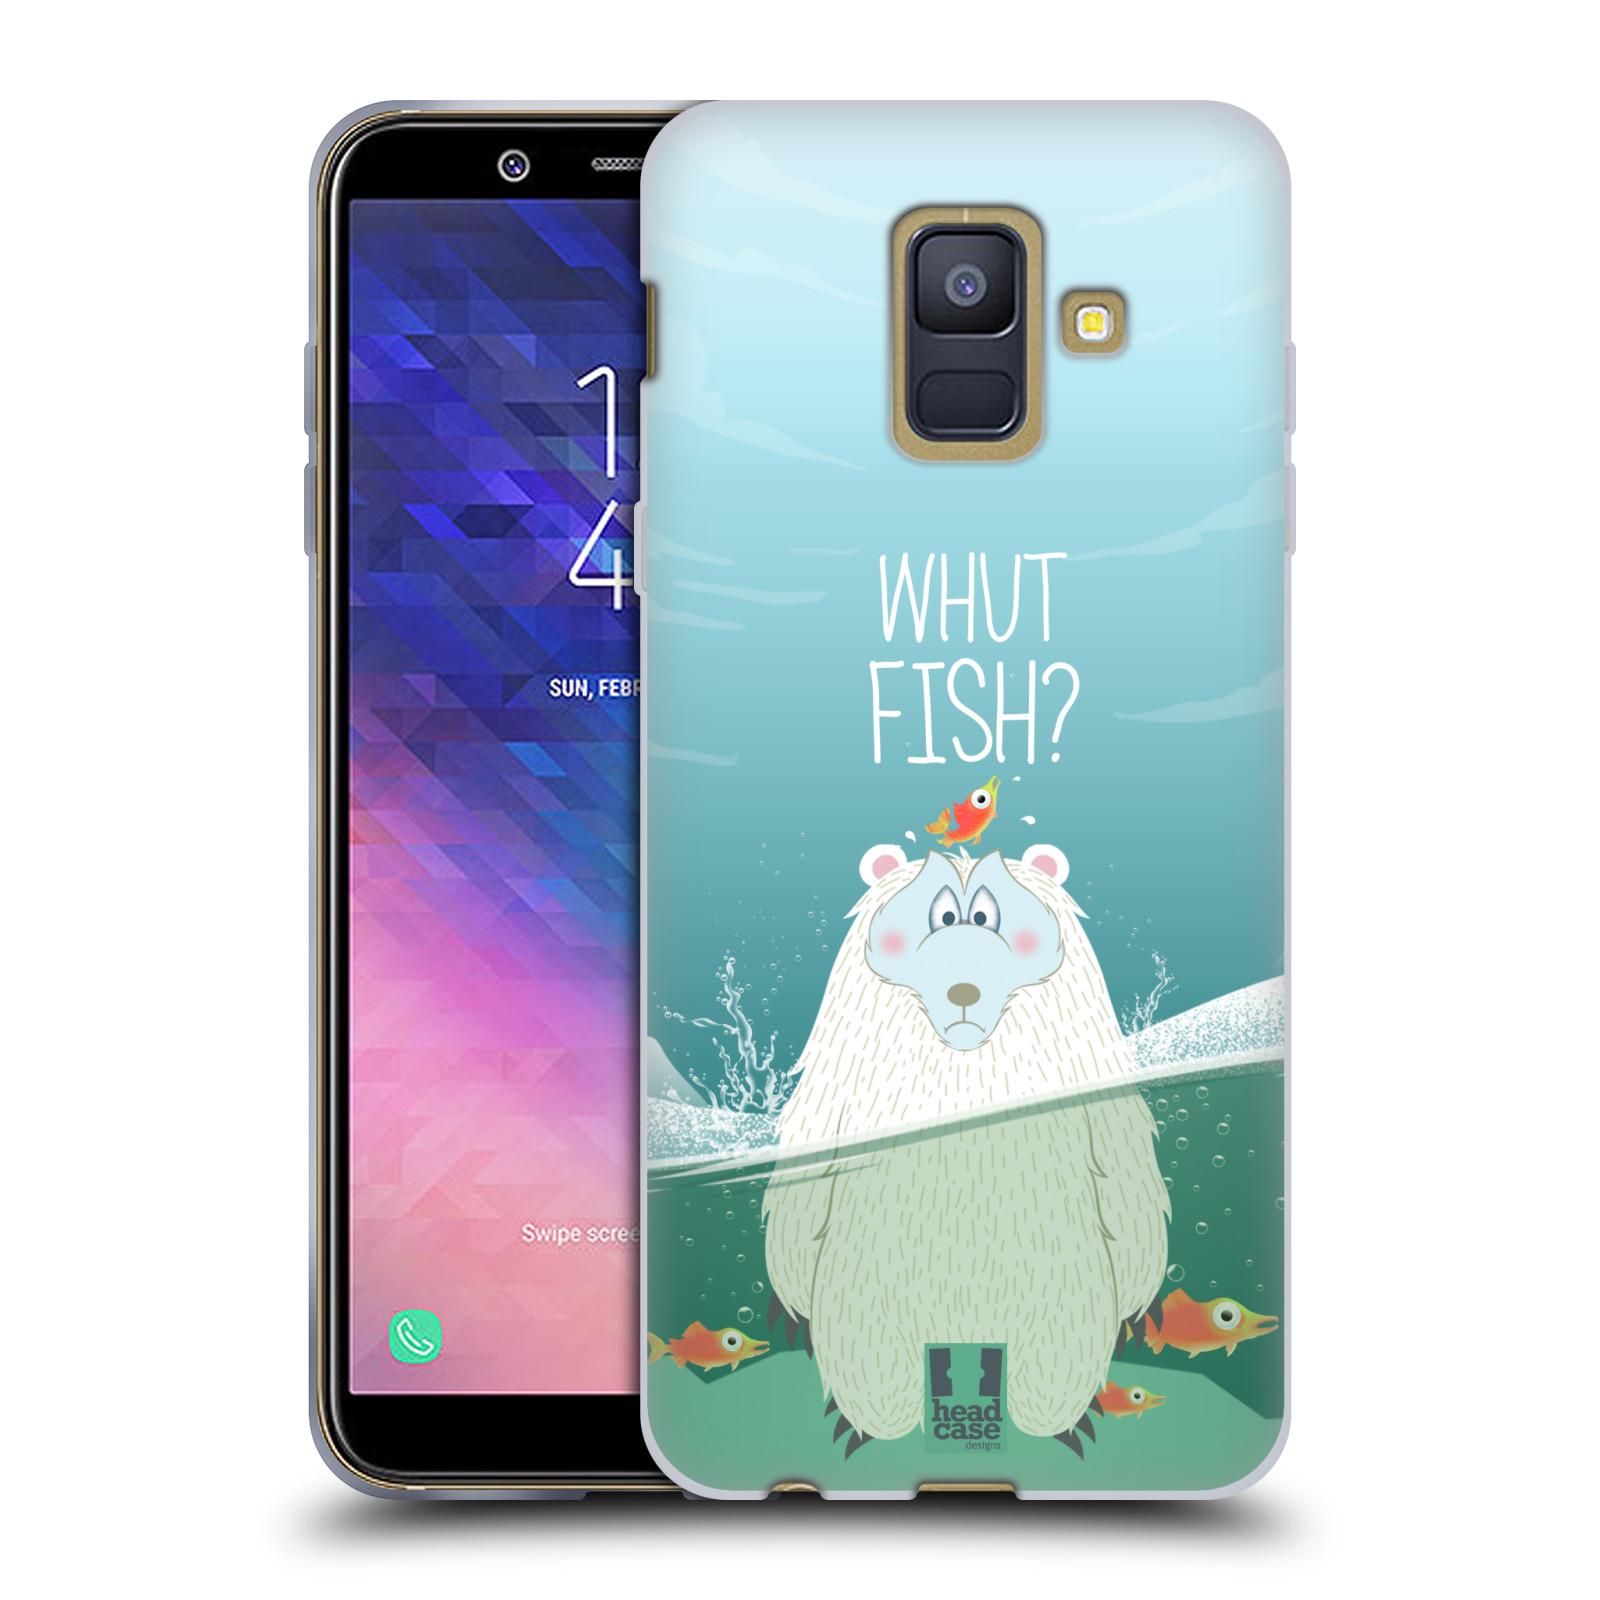 Silikonové pouzdro na mobil Samsung Galaxy A6 (2018) - Head Case - Medvěd Whut Fish?